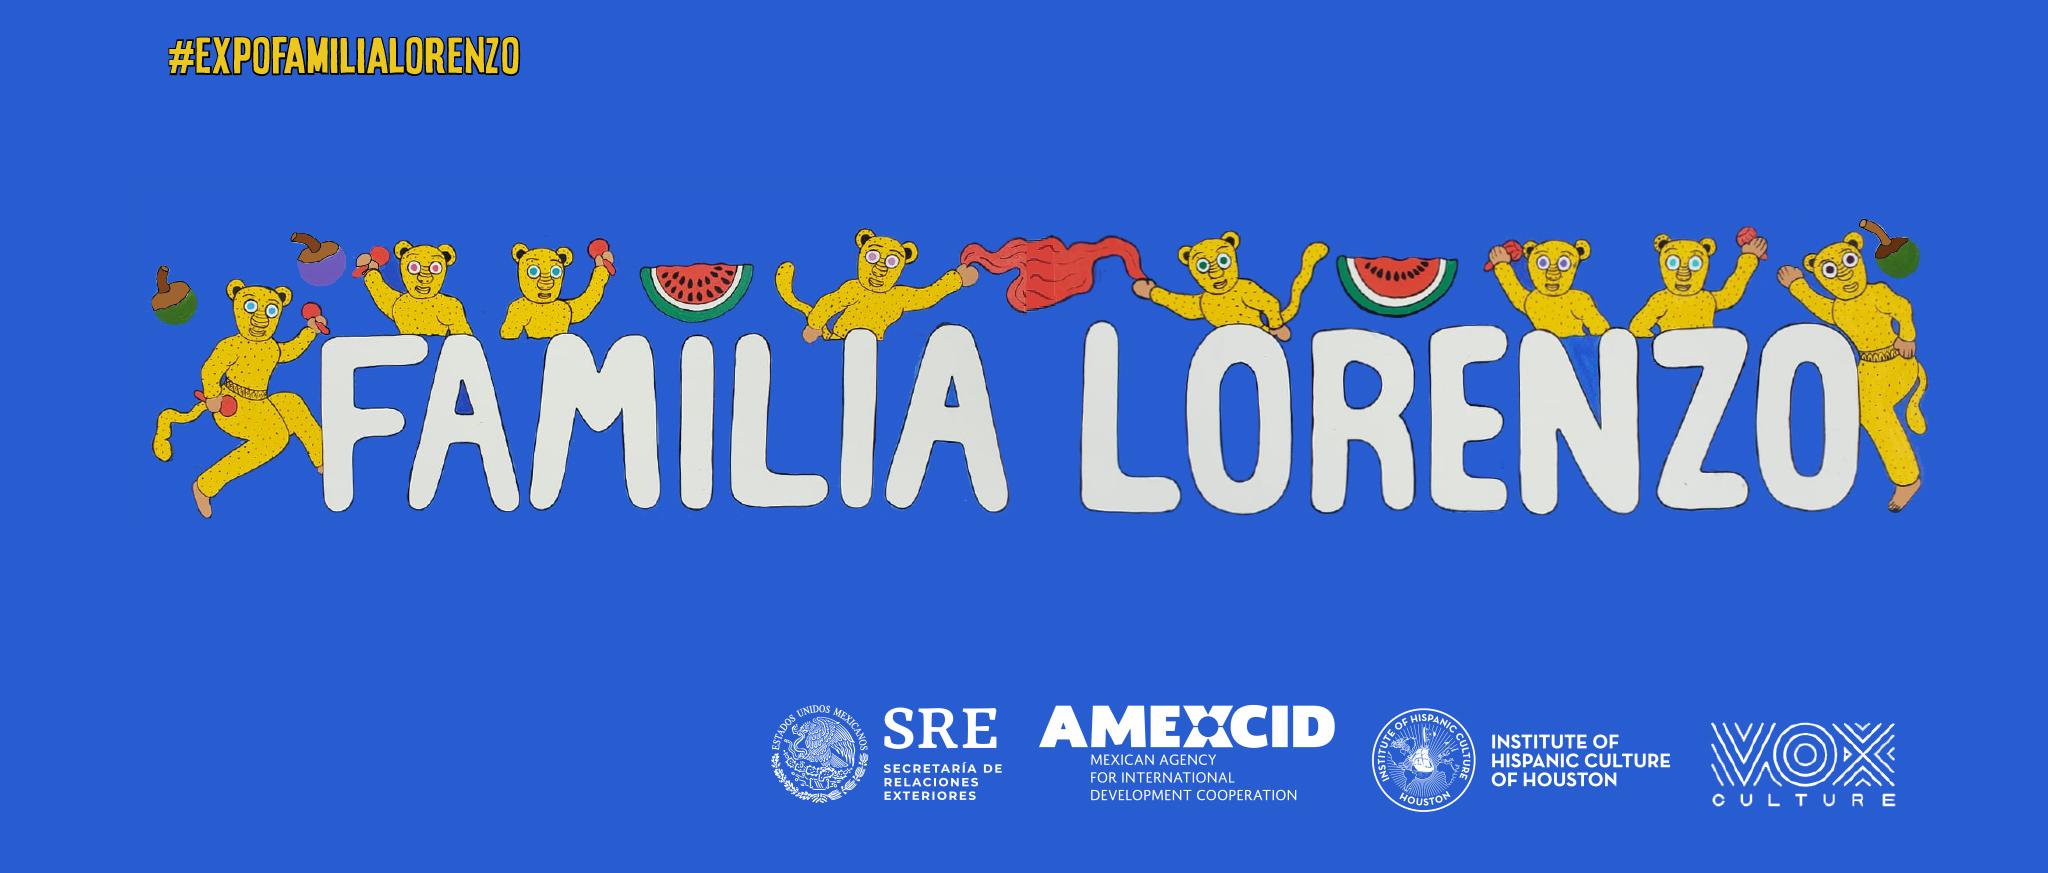 Expo Familia Lorenzo 2019